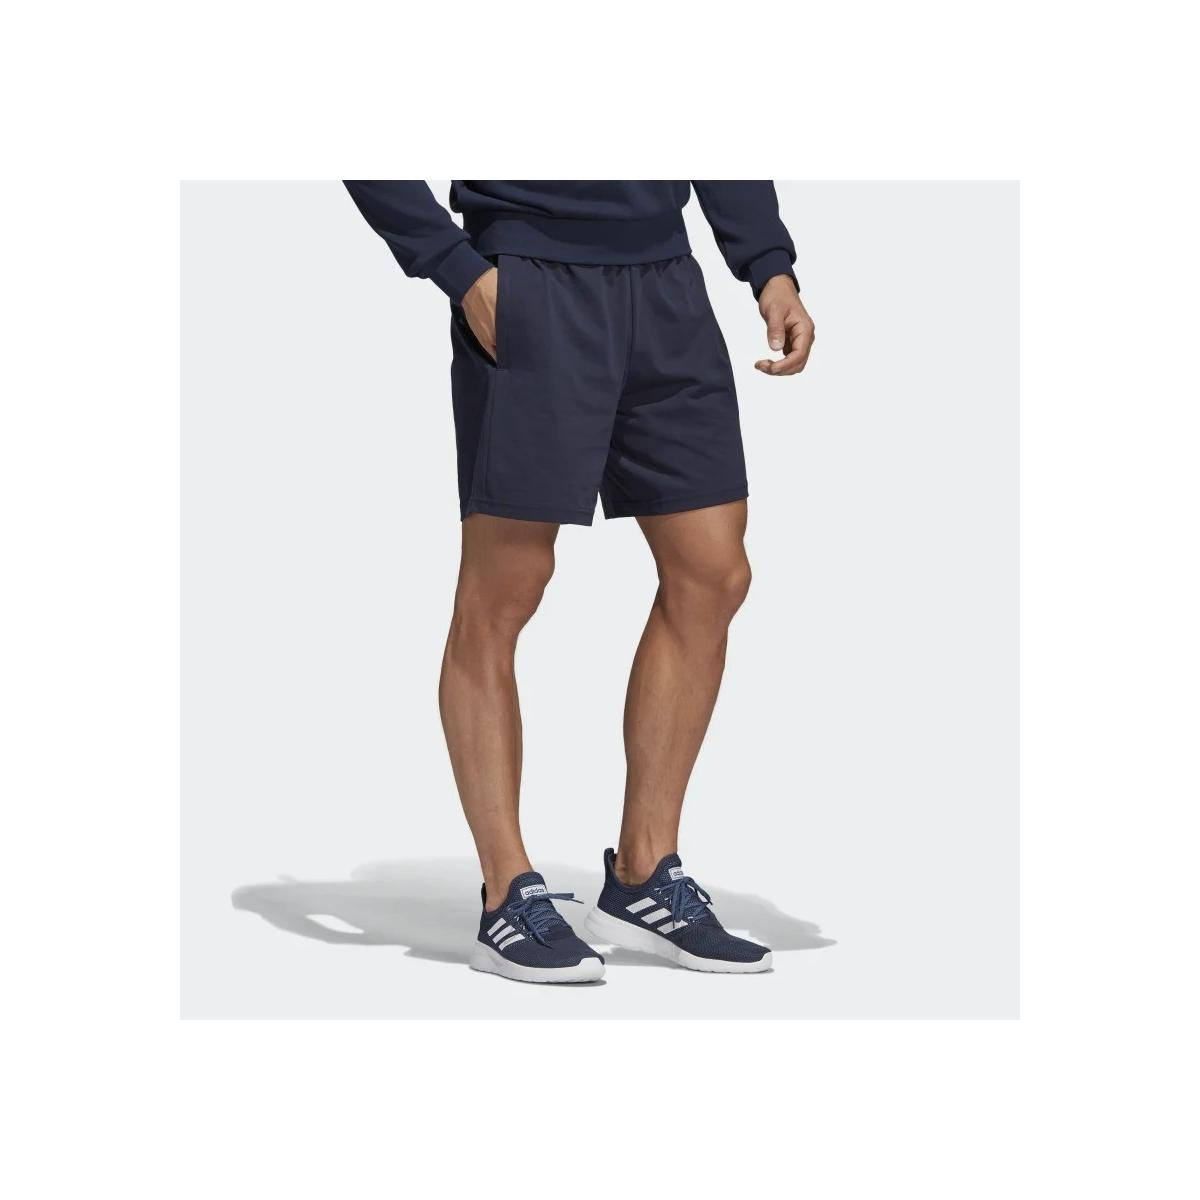 Shorts pantaloncini Adidas Linear sportivi con stampa laterale da uomo rif. DU0417